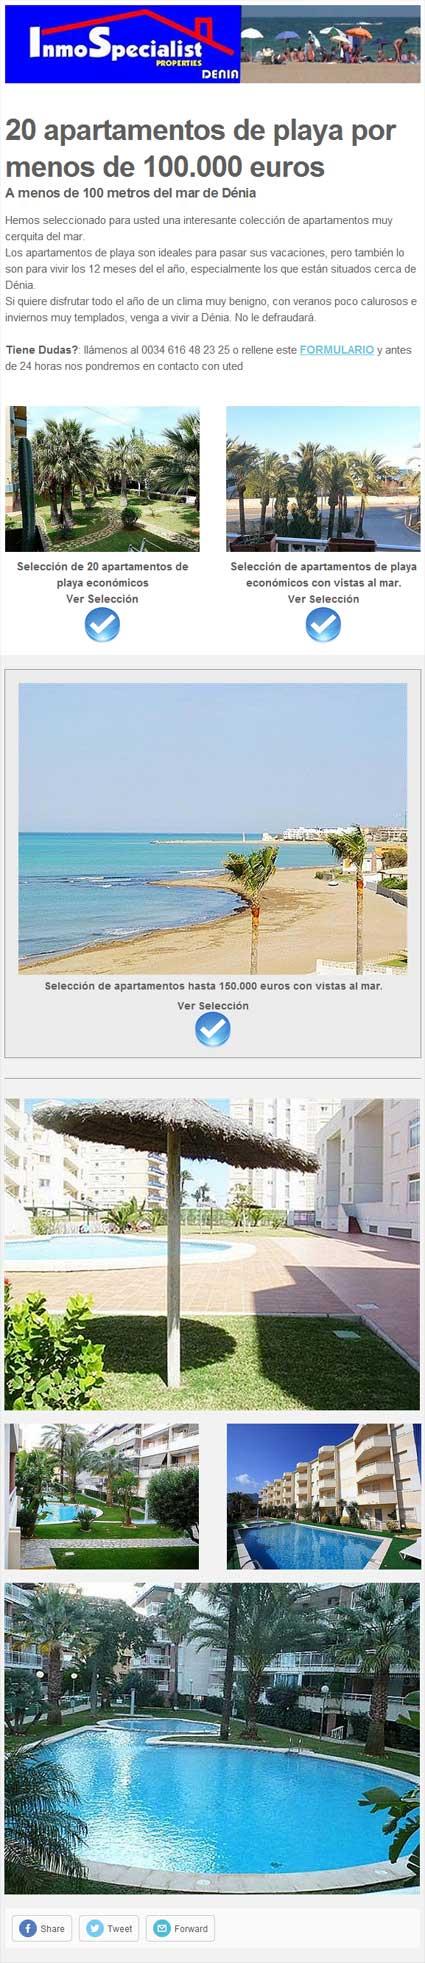 20 apartamentos de playa por menos de 100.000 euros